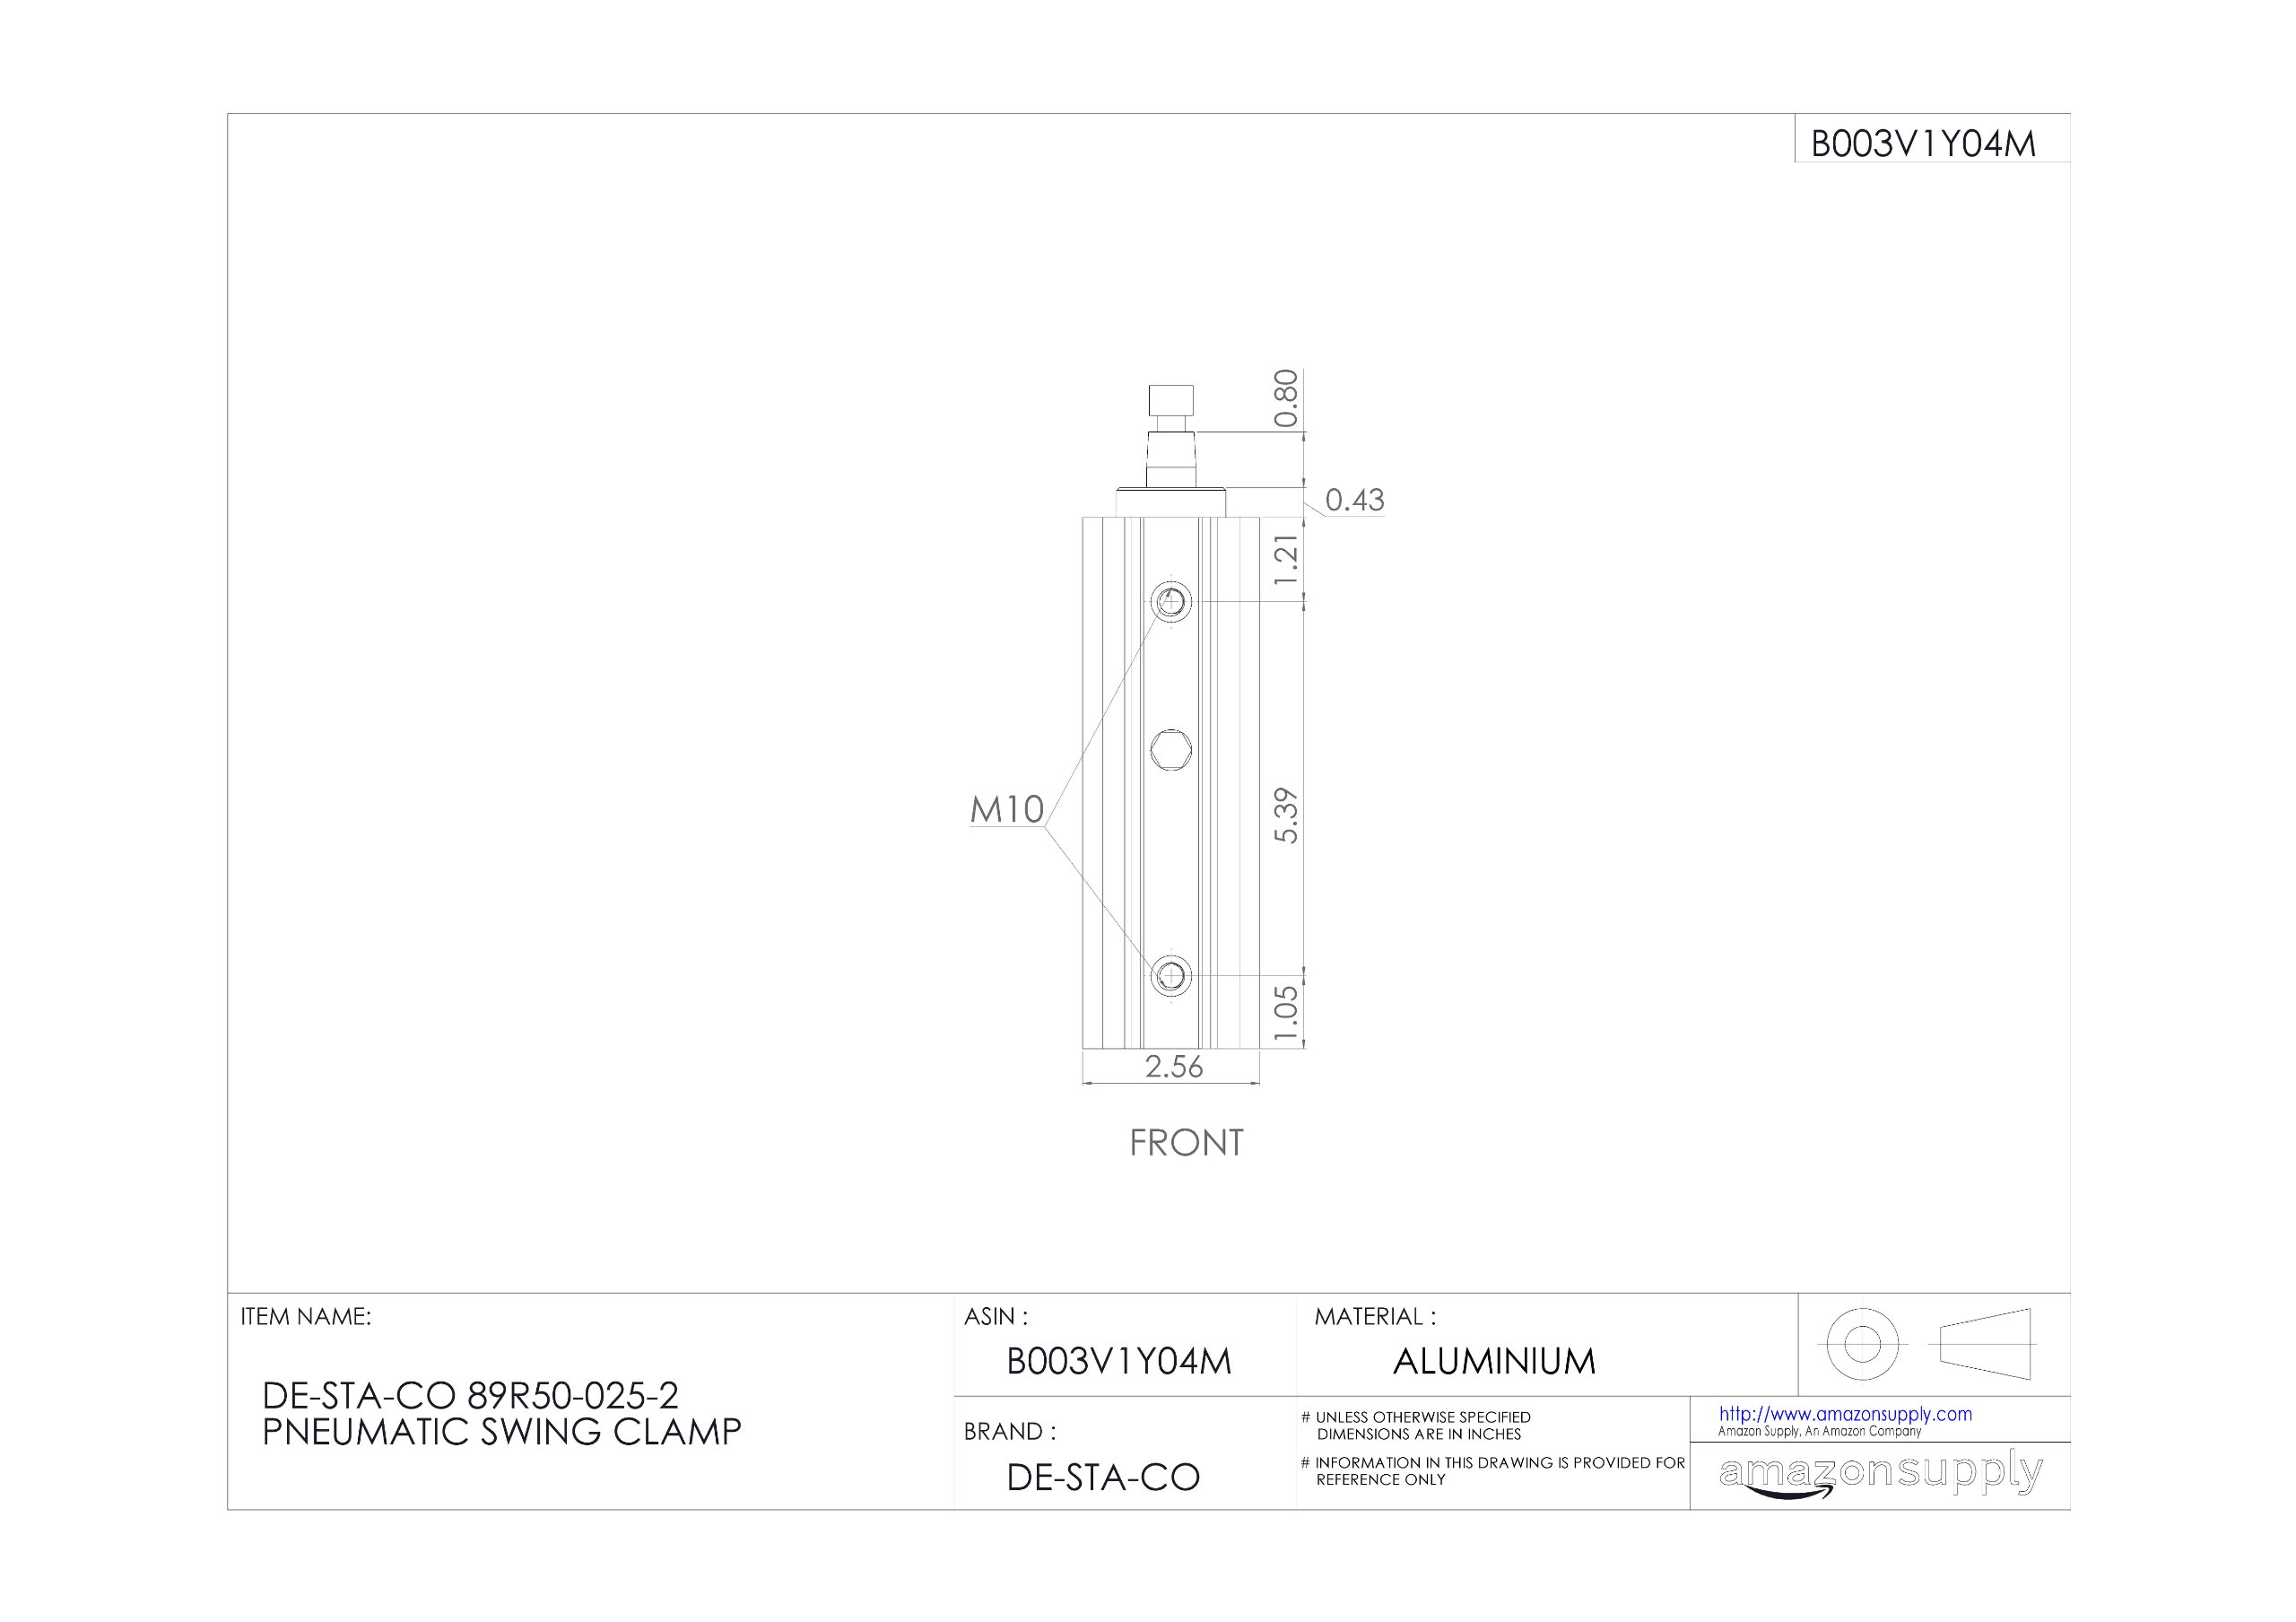 DE-STA-CO 89R50-025-2 Pneumatic Swing Clamp by De-Sta-Co (Image #2)